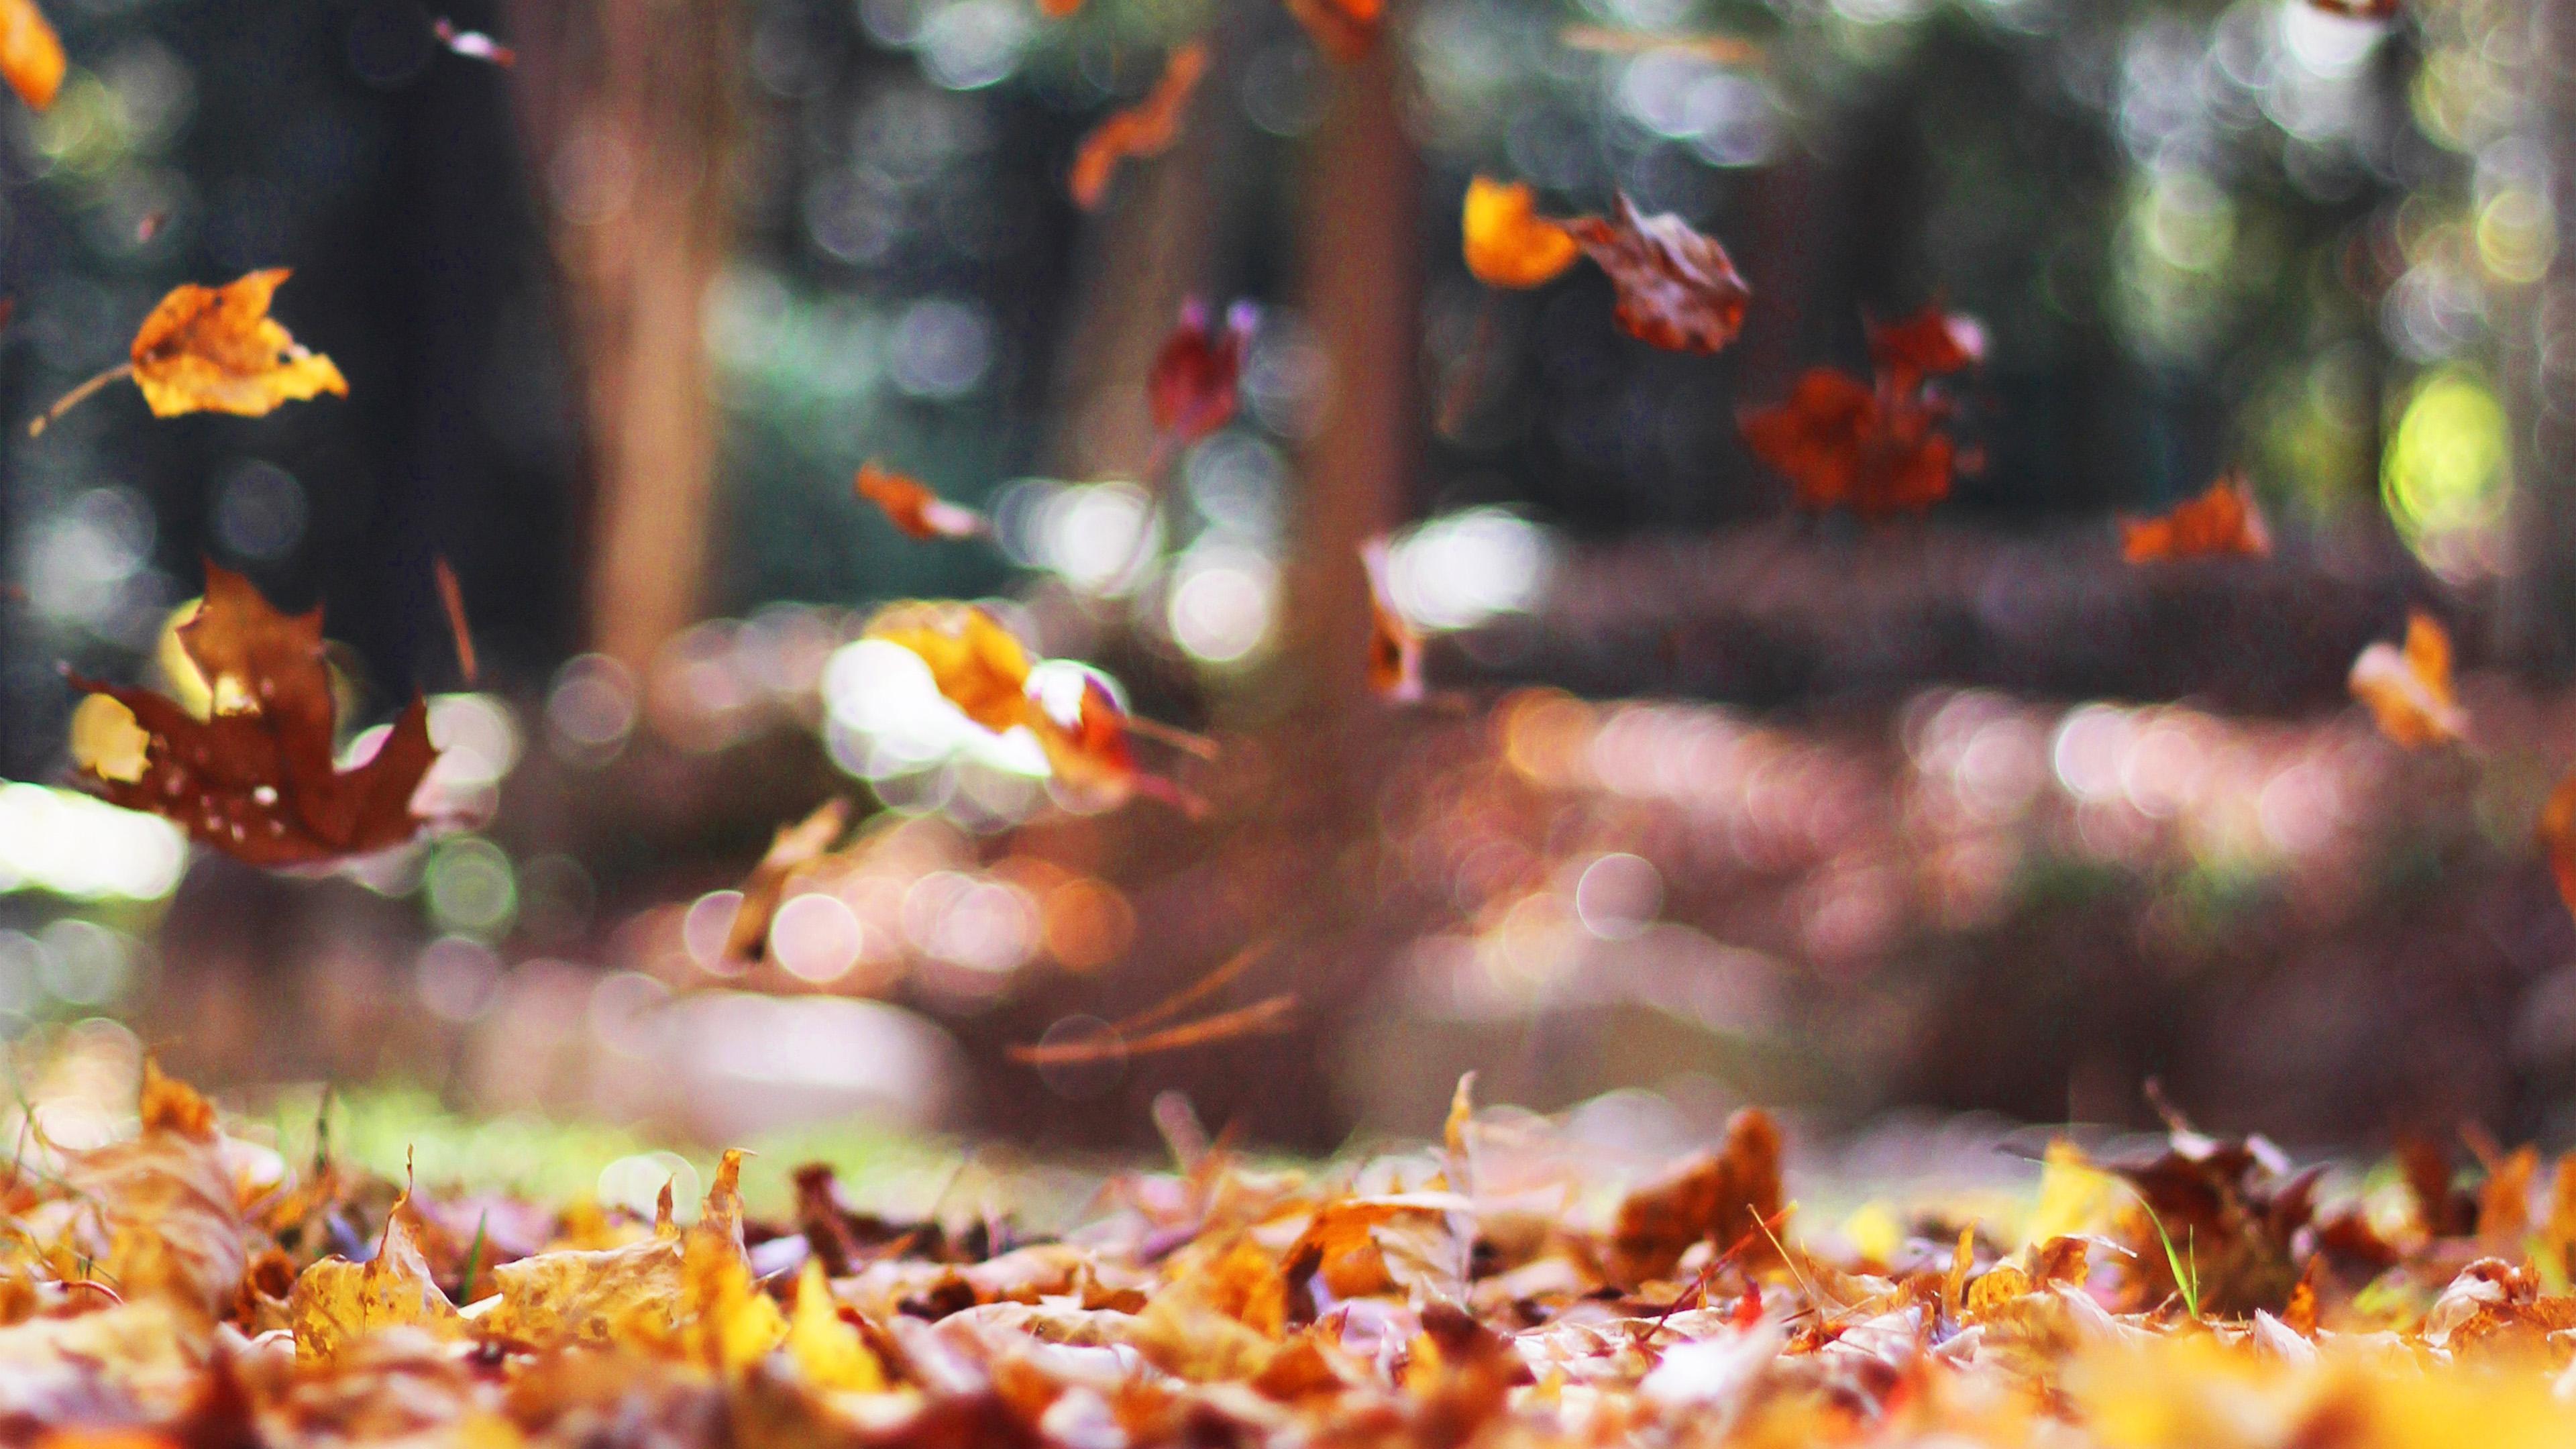 wallpaper for desktop, laptop | mw77-fall-leaves-nature ...